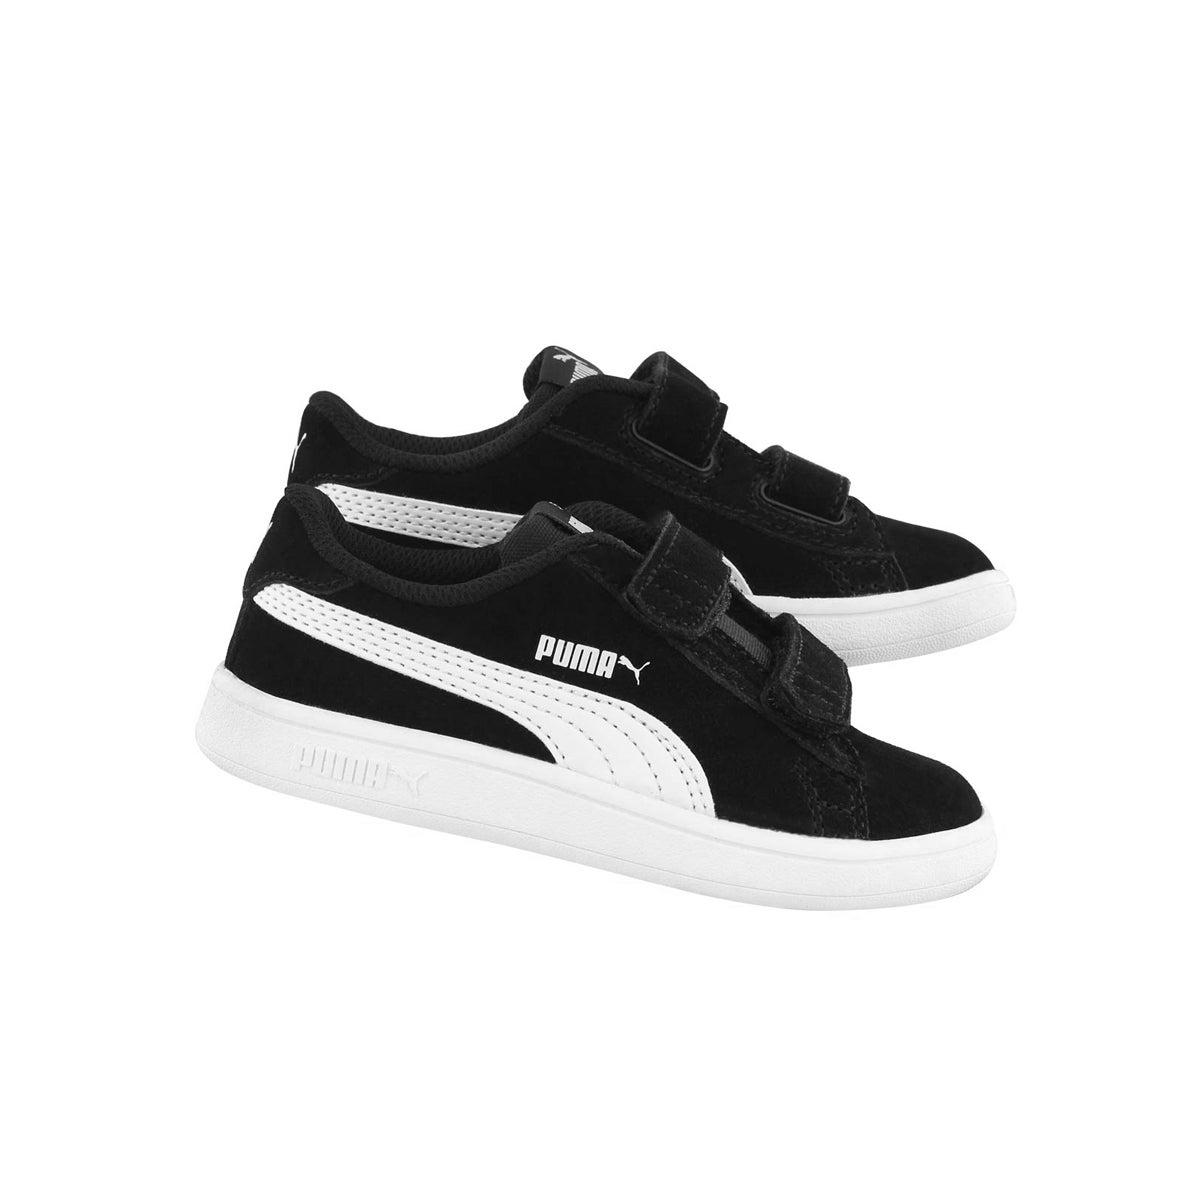 Inf-b Puma Smash v2 black sneaker